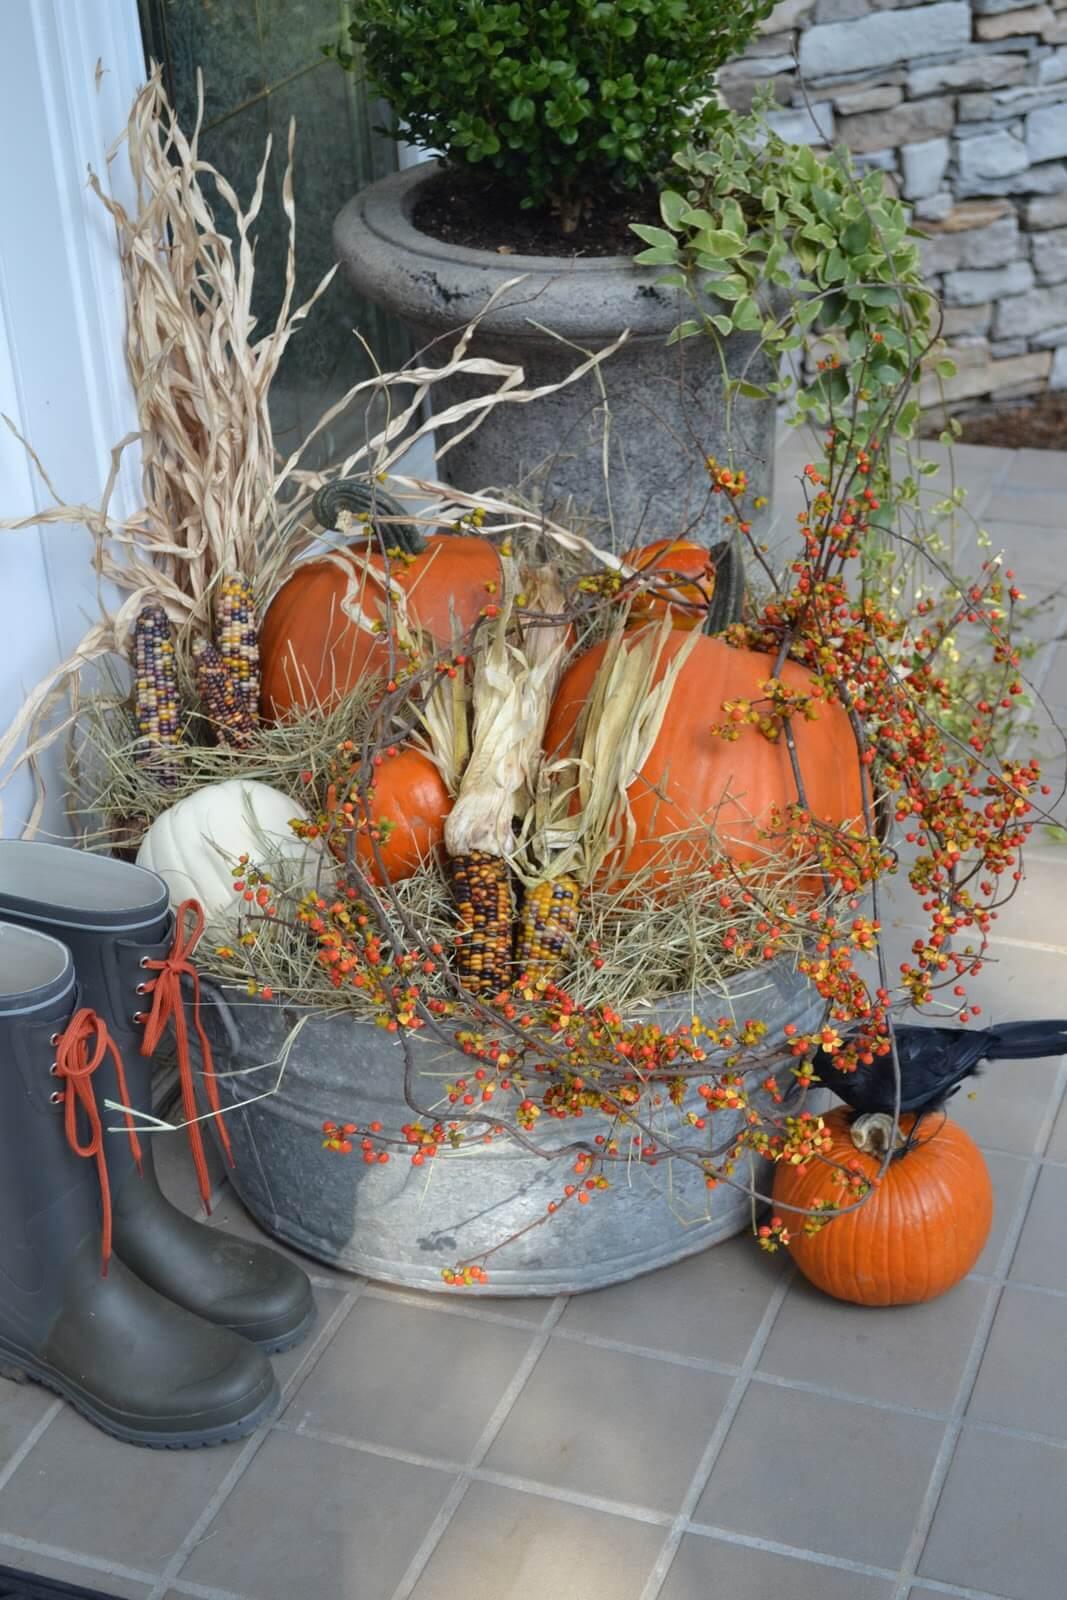 Fall Harvest Pumpkin and Corn Galvanized Tub